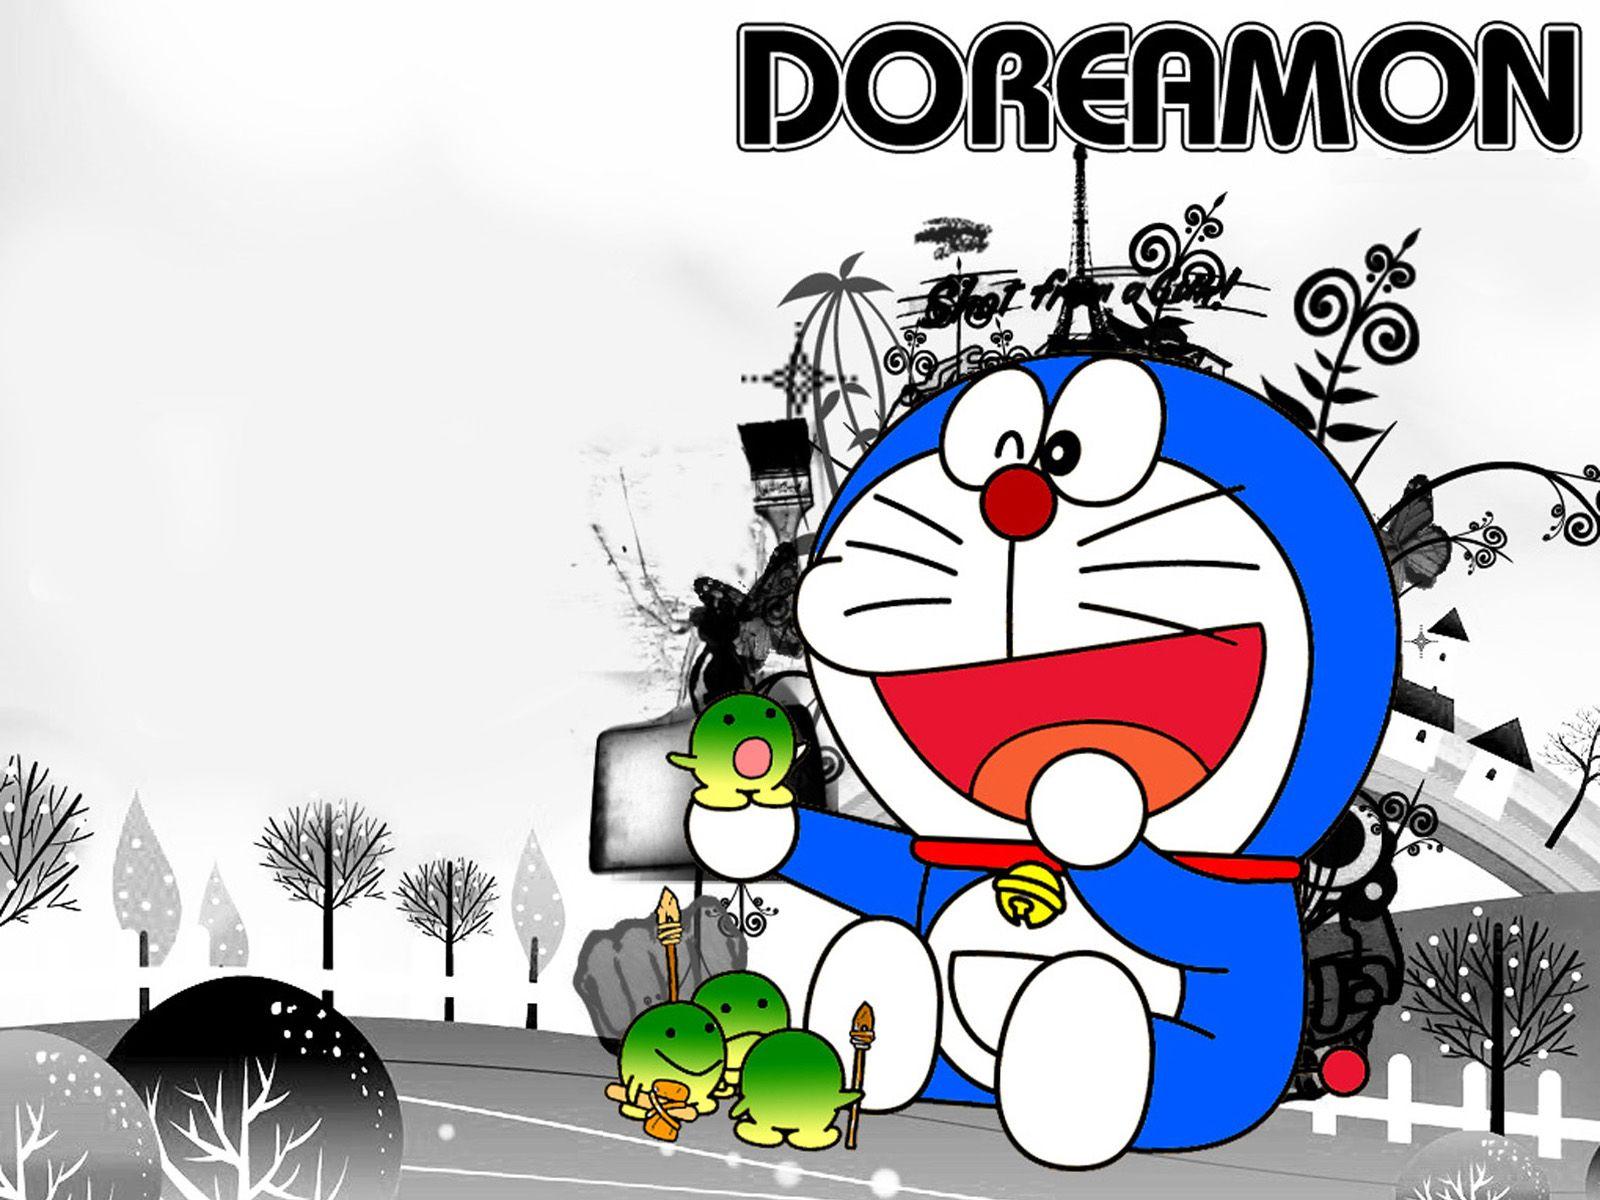 Download 1020+ Wallpaper Doraemon Download Gambar Doraemon Foto Gratis